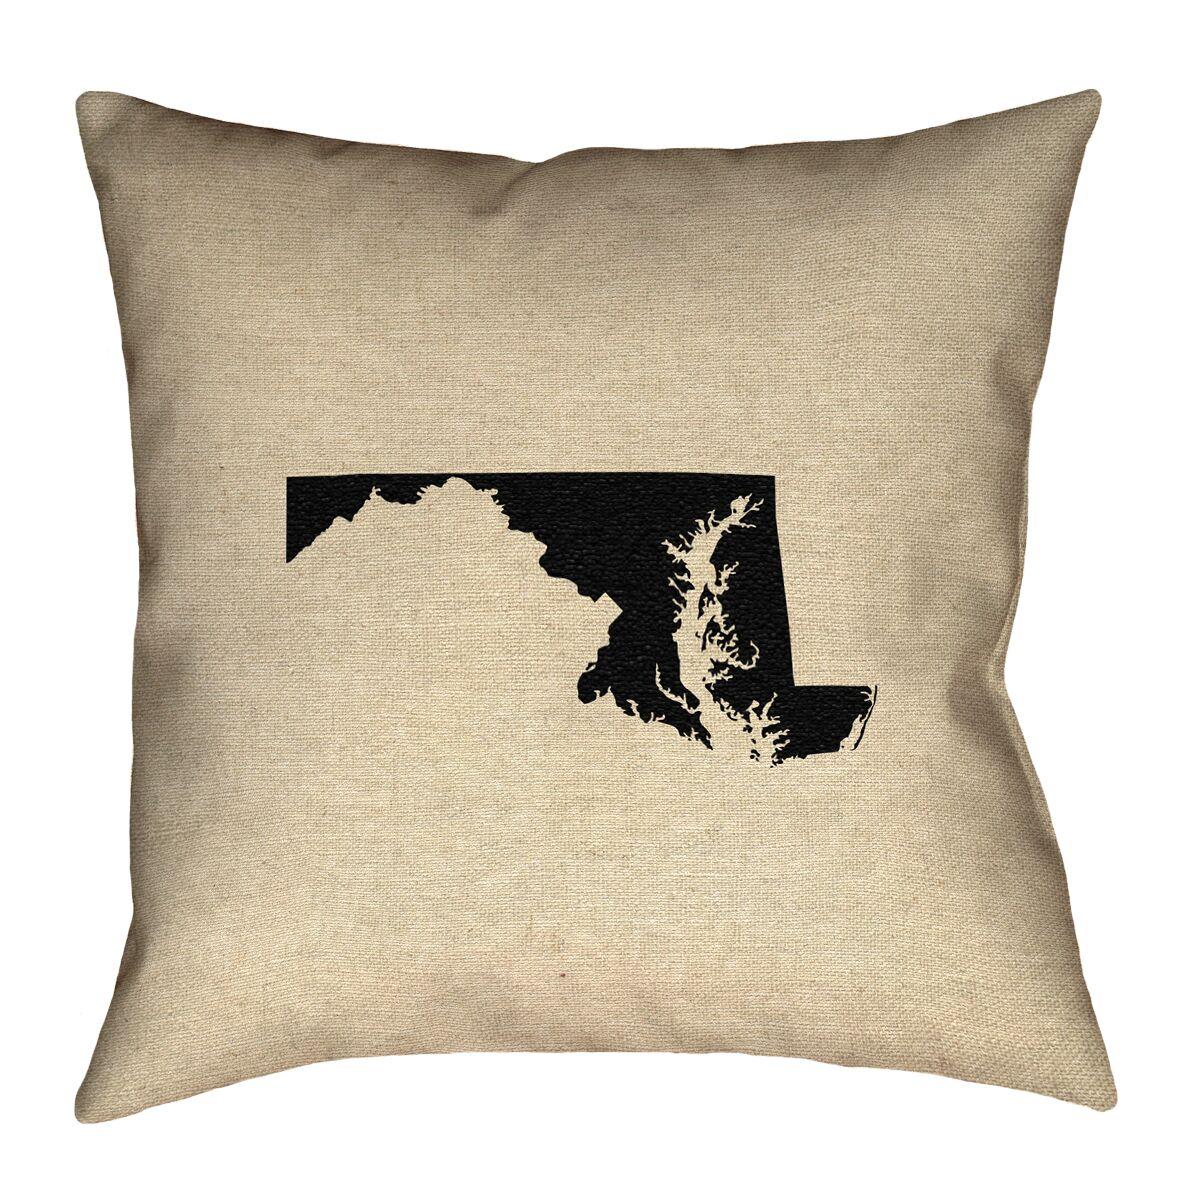 Austrinus Maryland Square Outdoor Throw Pillow Size: 20